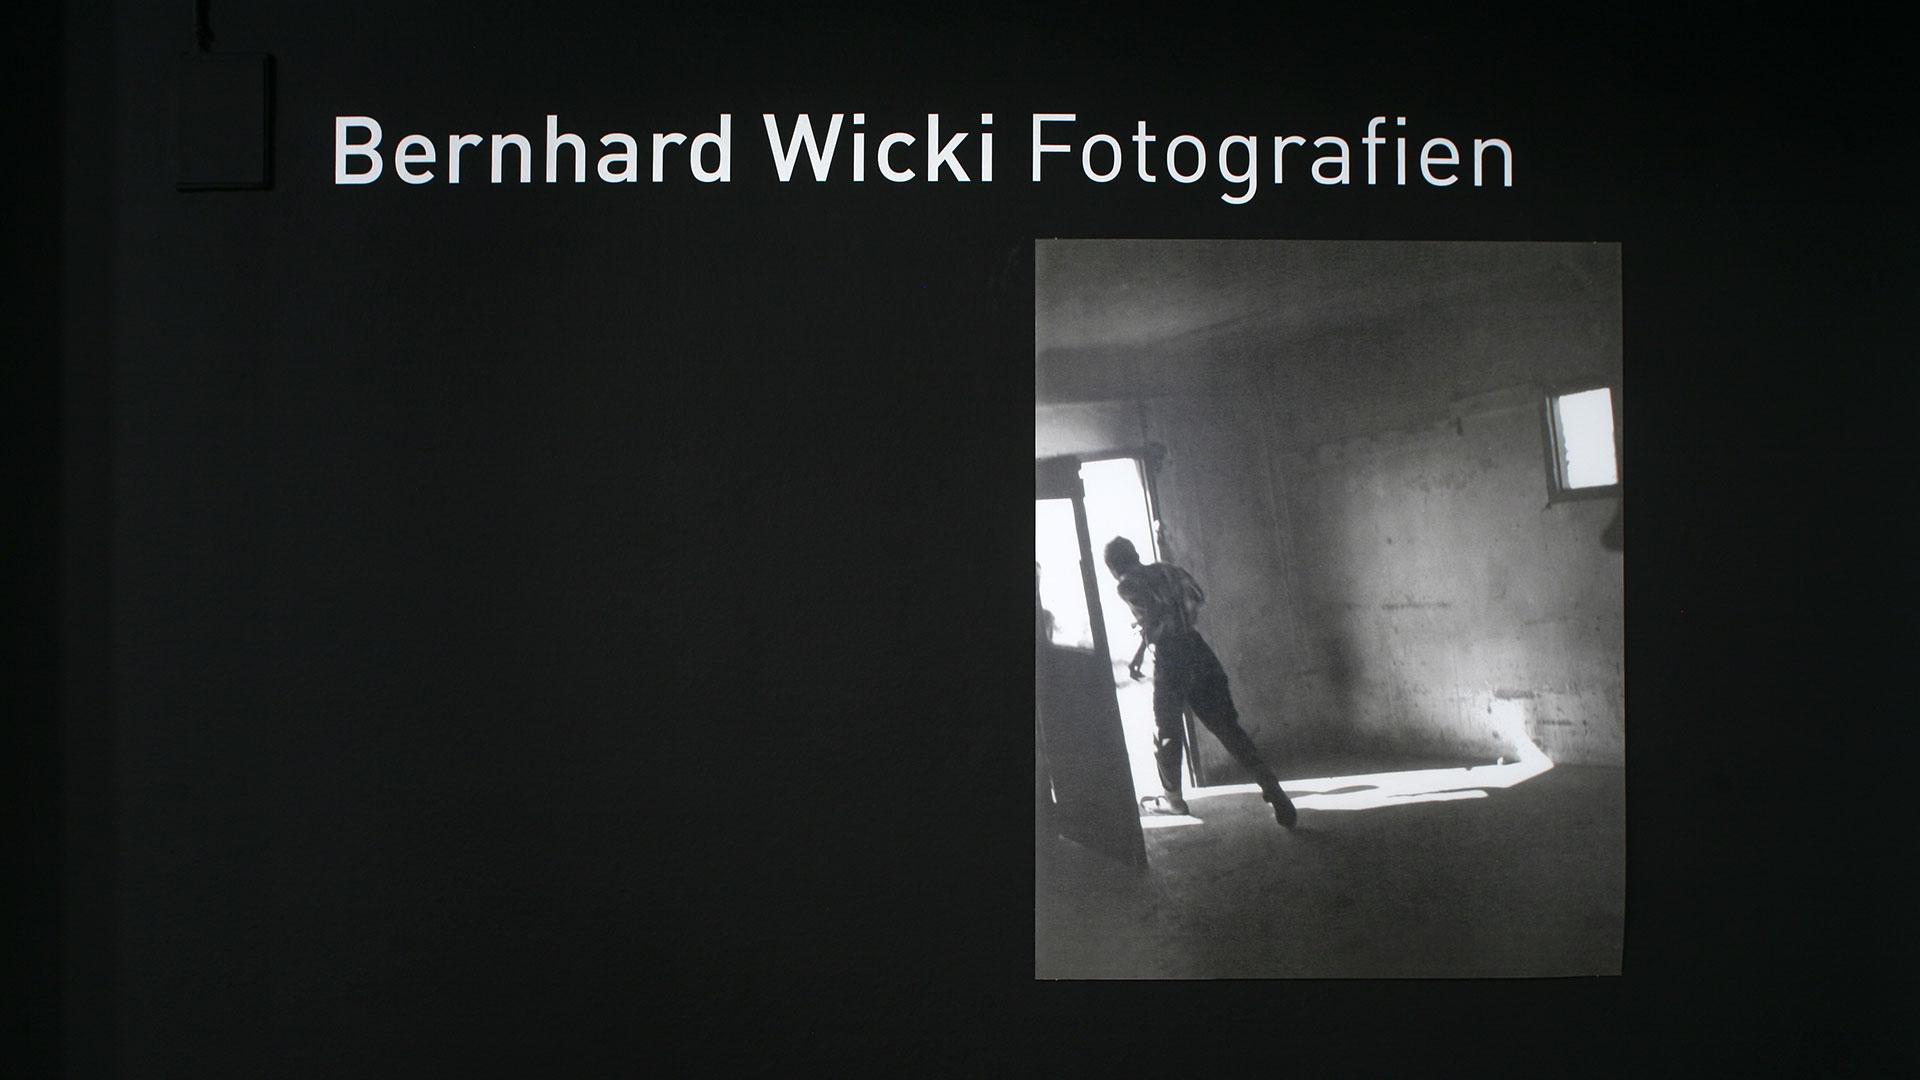 Bernhard Wicki Fotografien